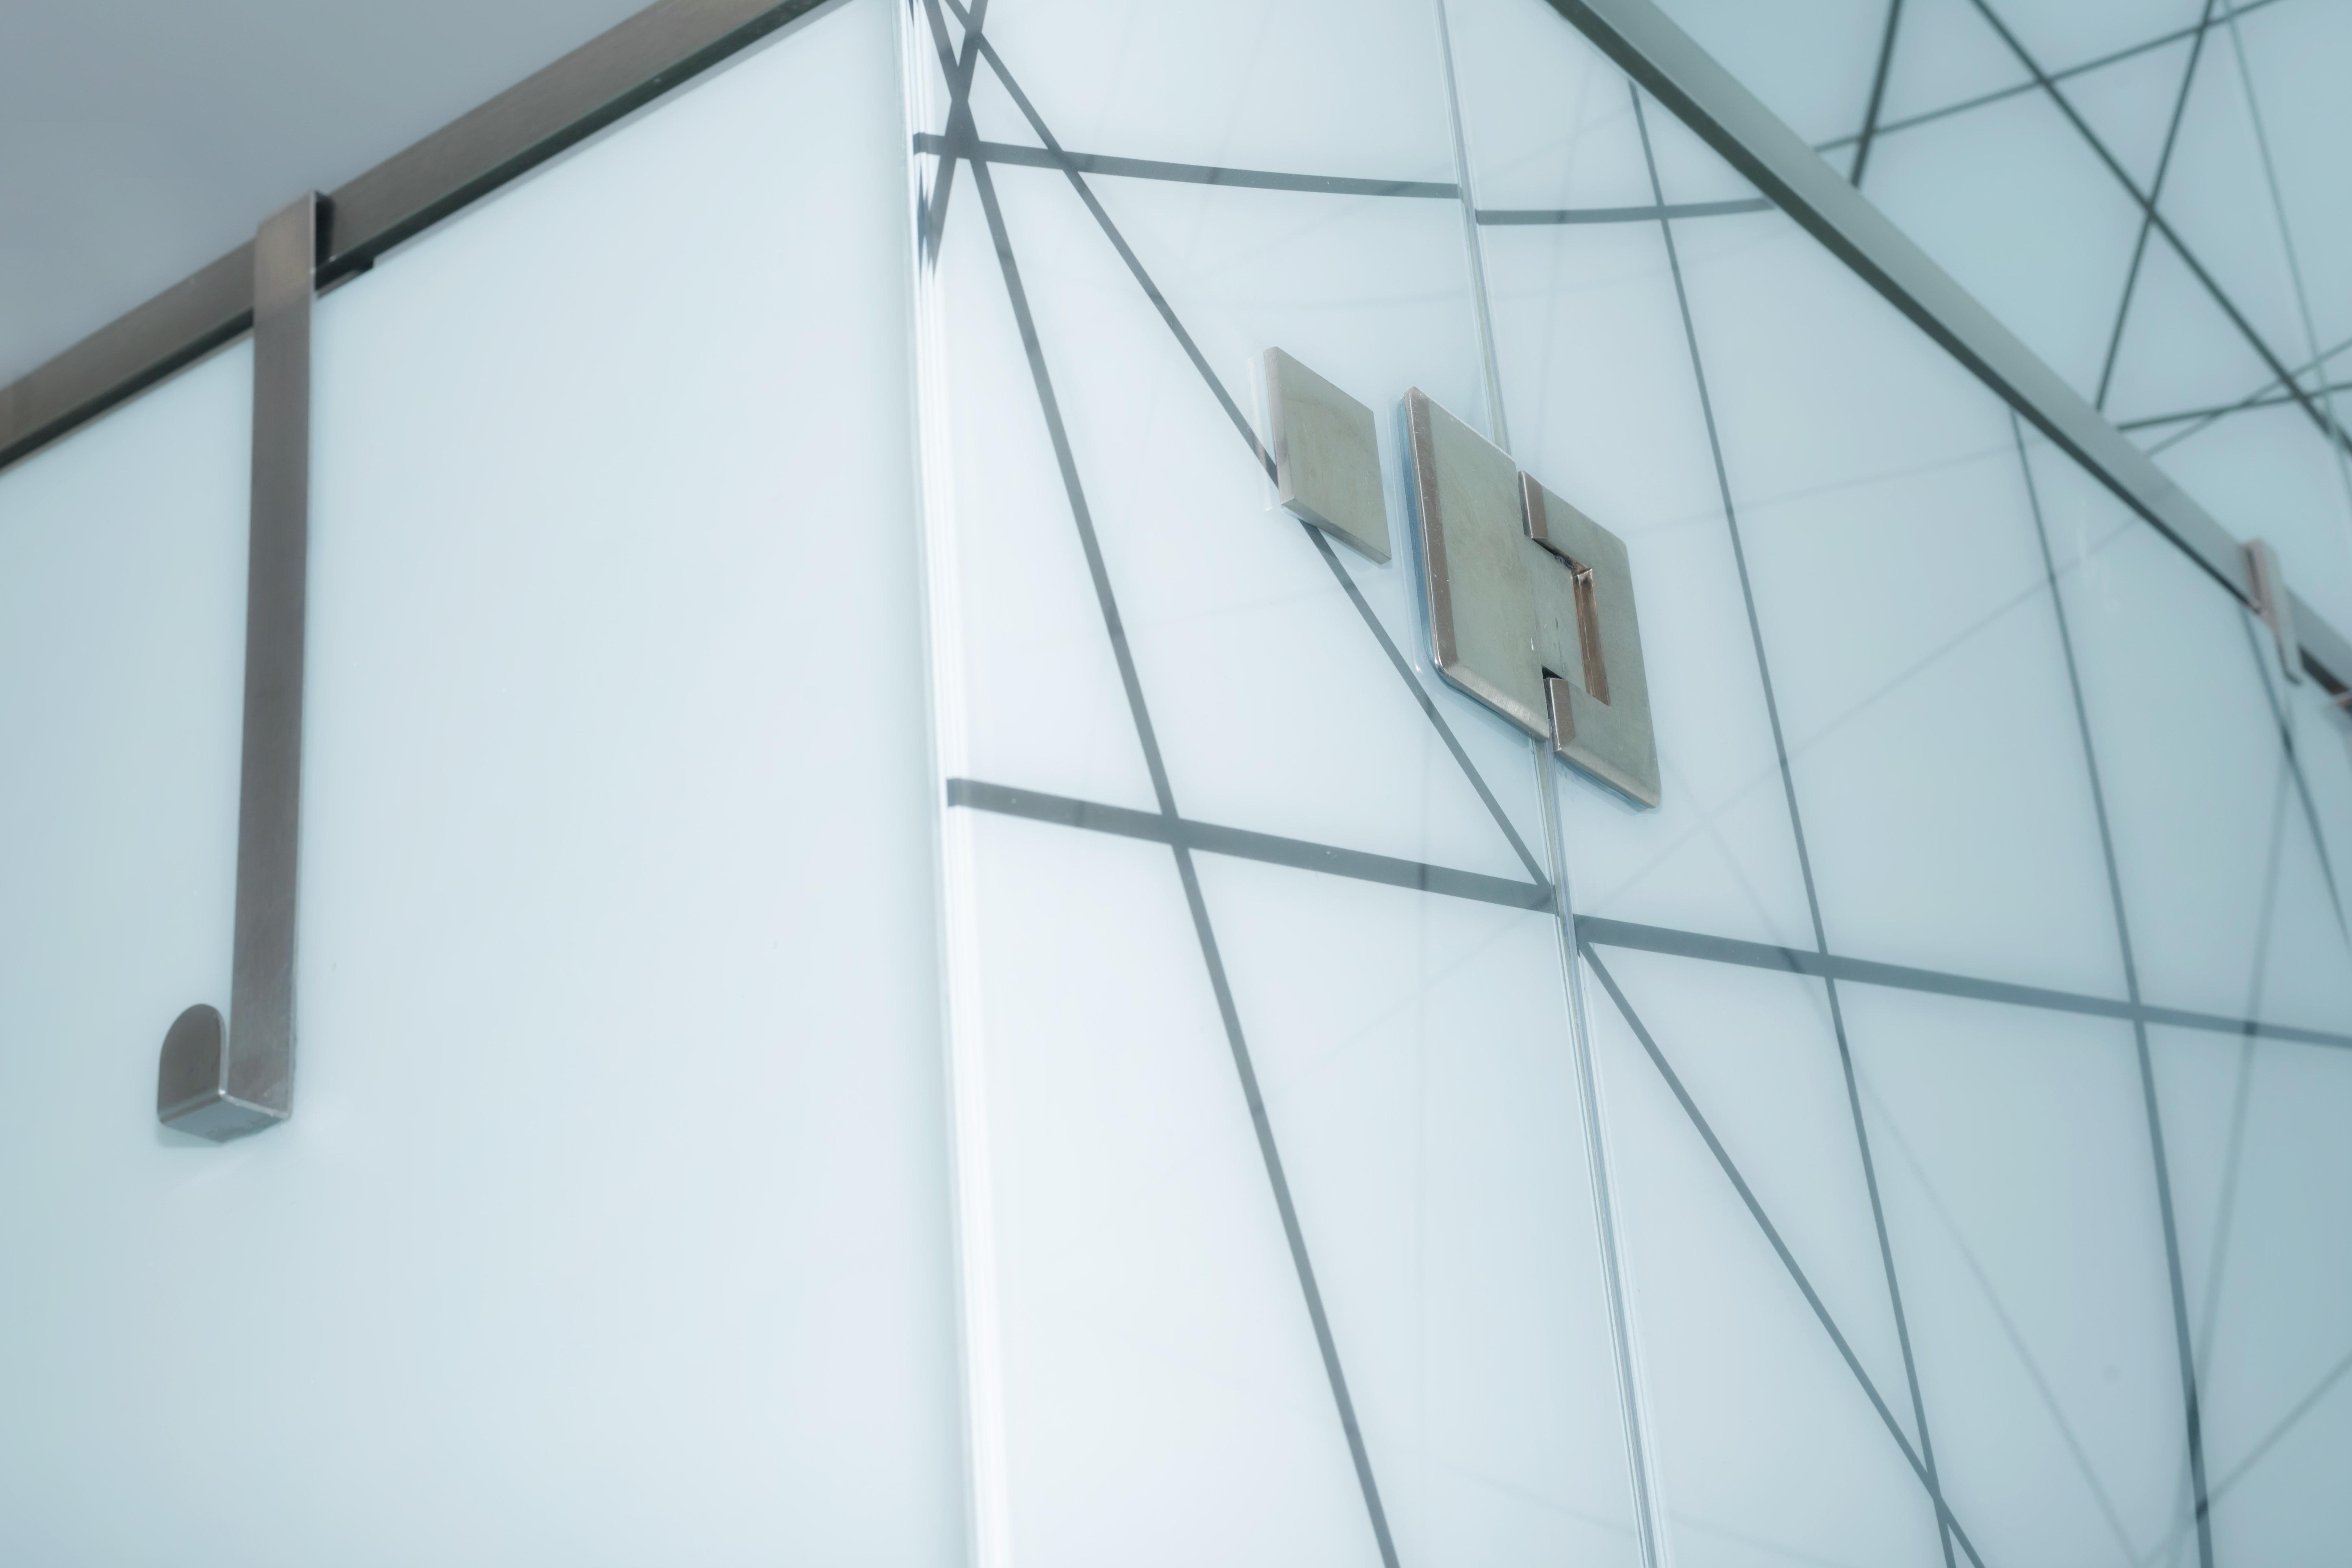 Compartimentari sticla laminata cu folie alba 4.2.4 mm transparent design mall vitan